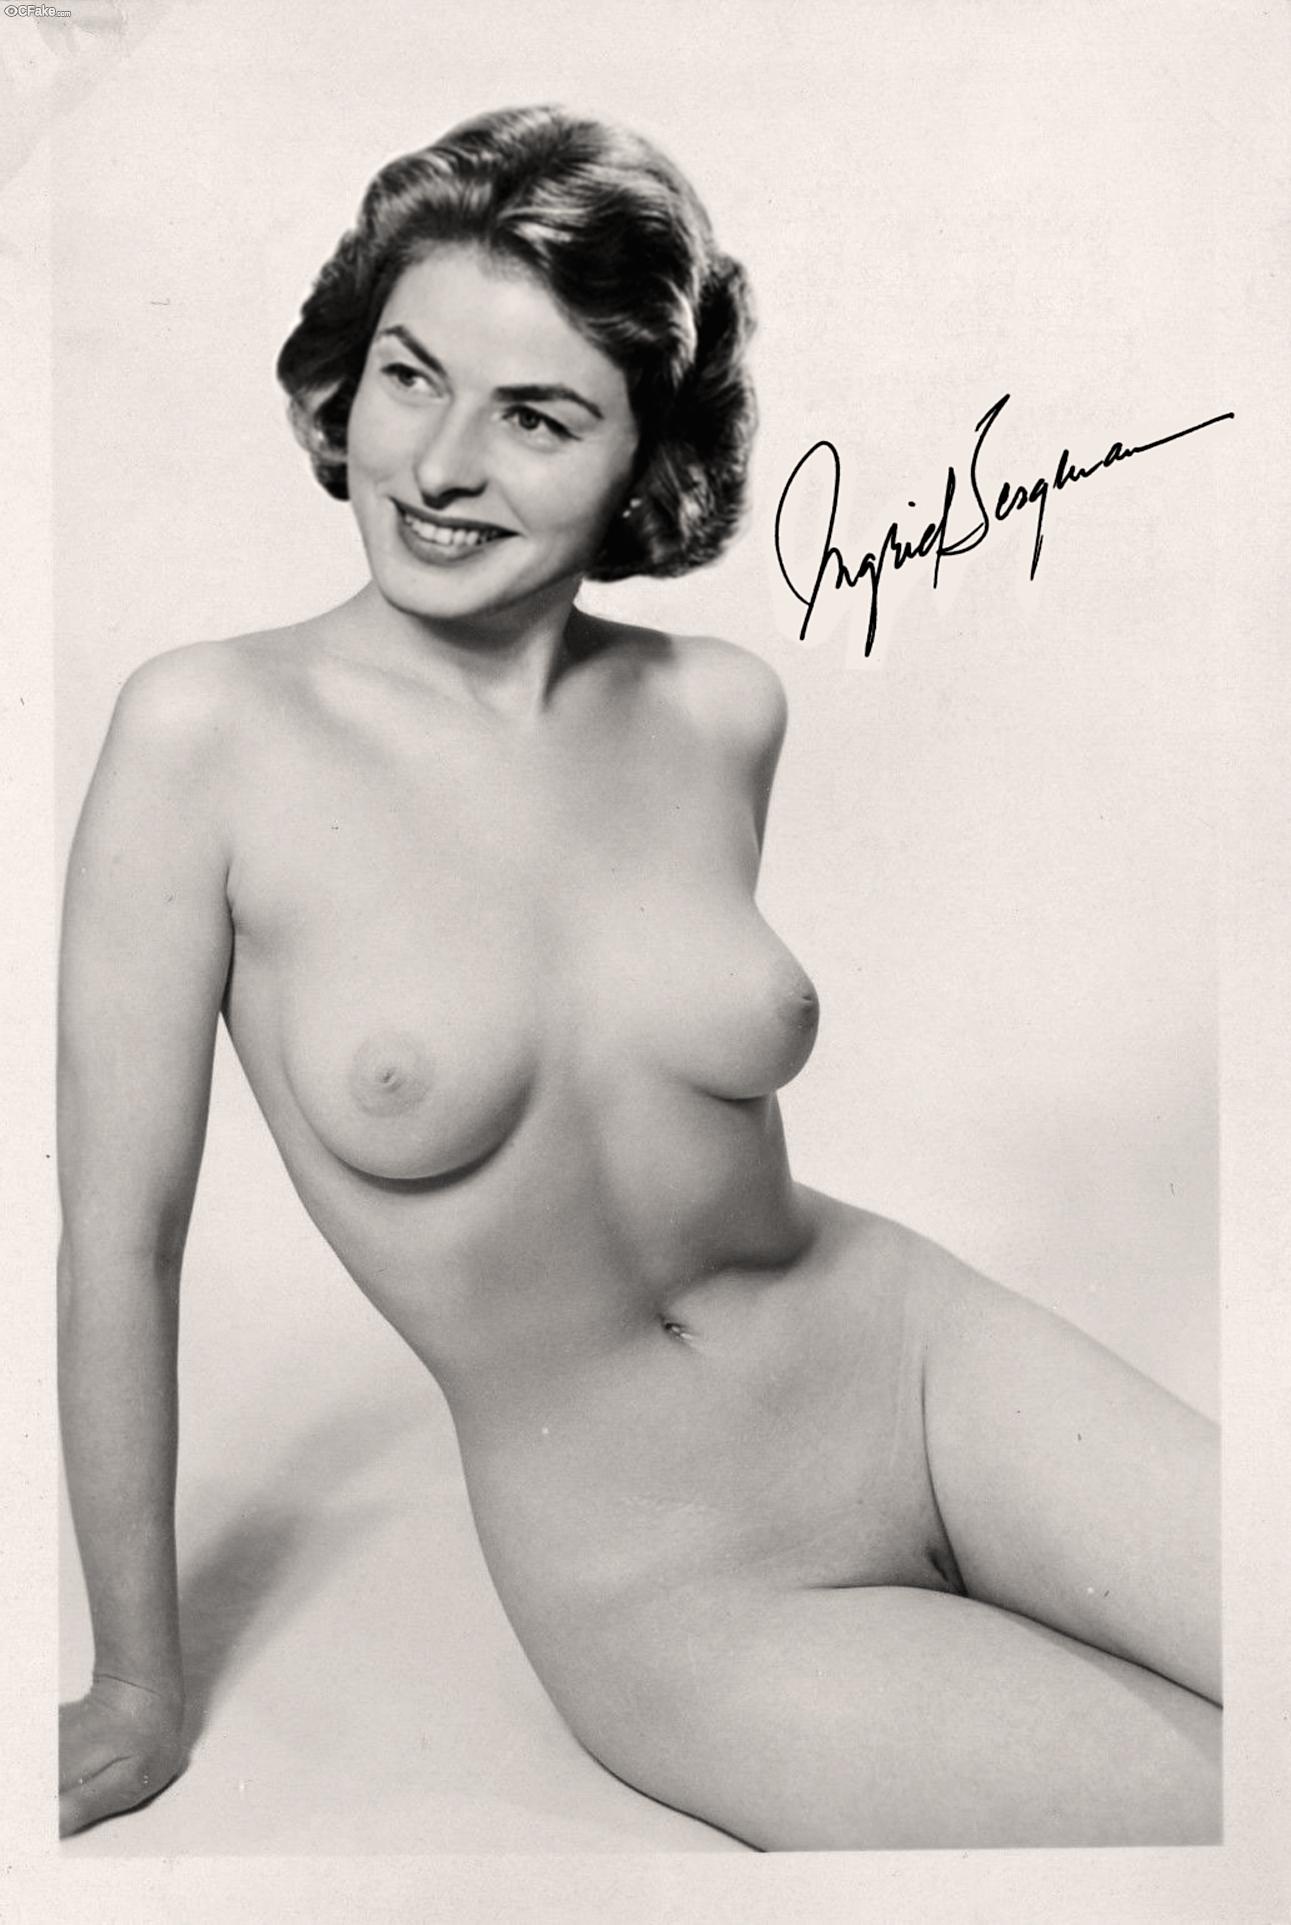 Nude Pictures Of Ingrid Coronado Hq Porn Pics